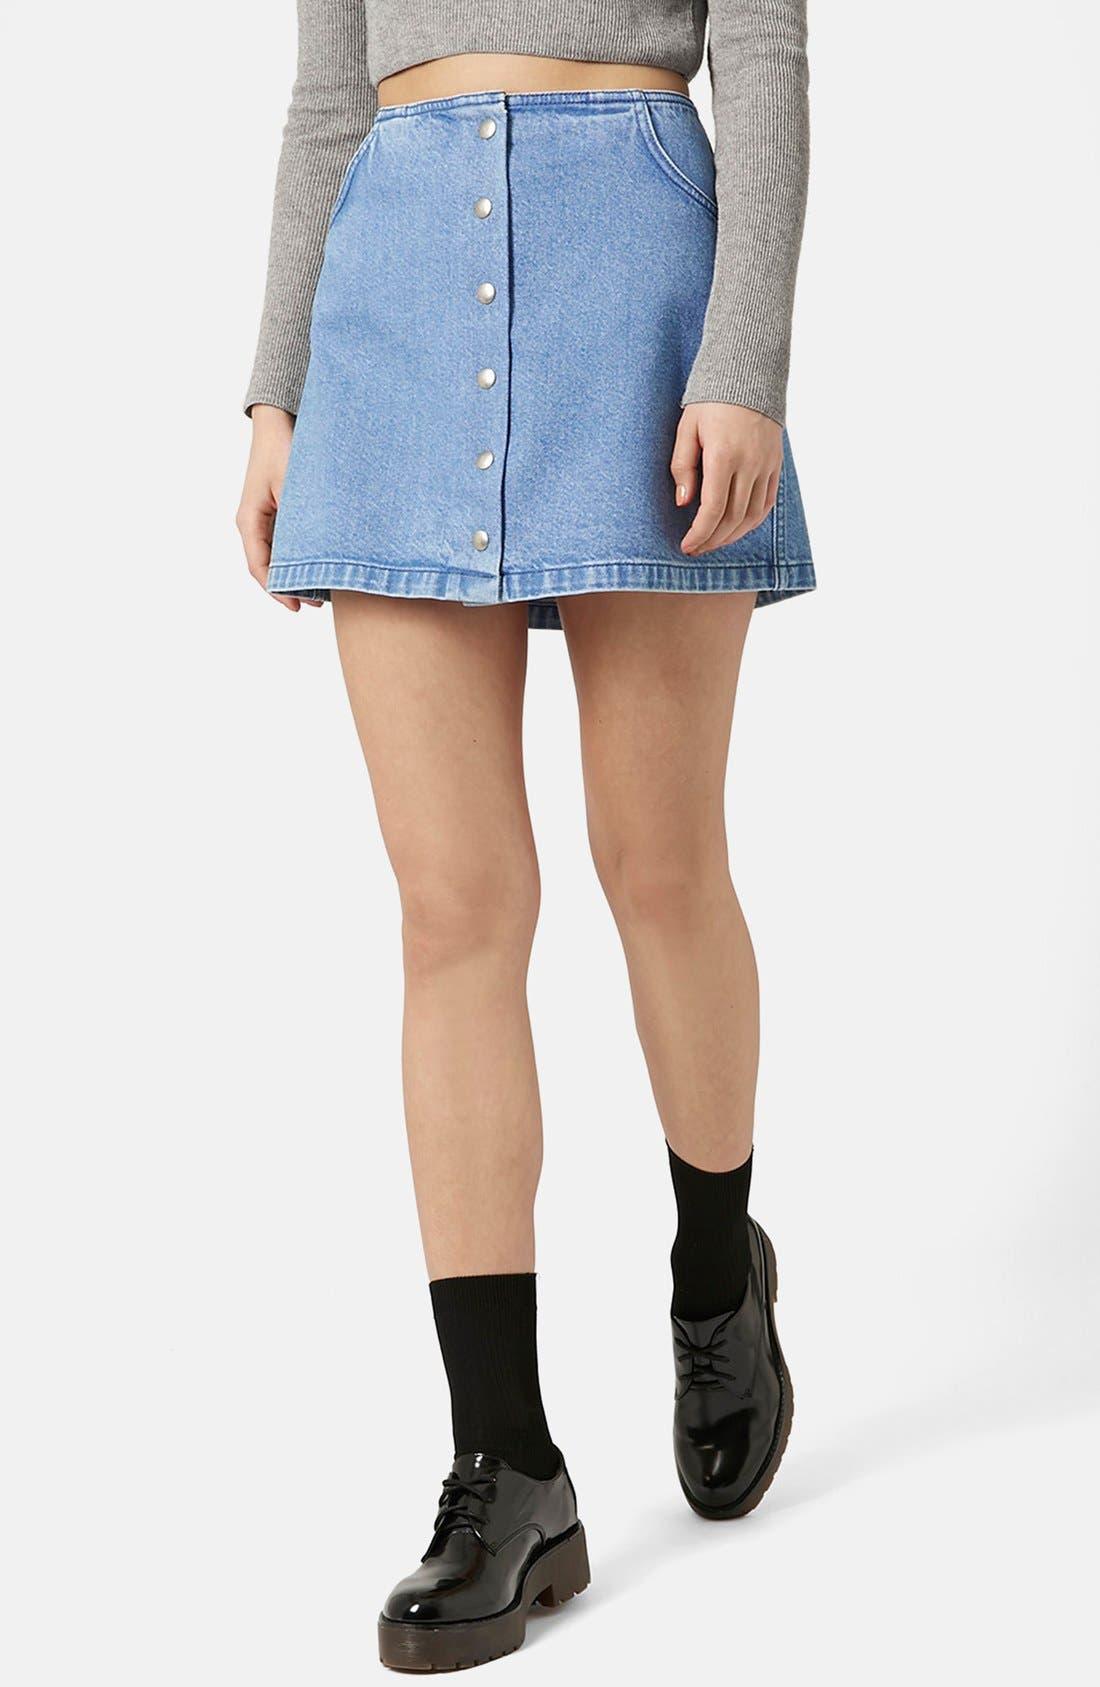 Alternate Image 1 Selected - Topshop Moto Snap Front Denim Skirt (Brit Pop-In)